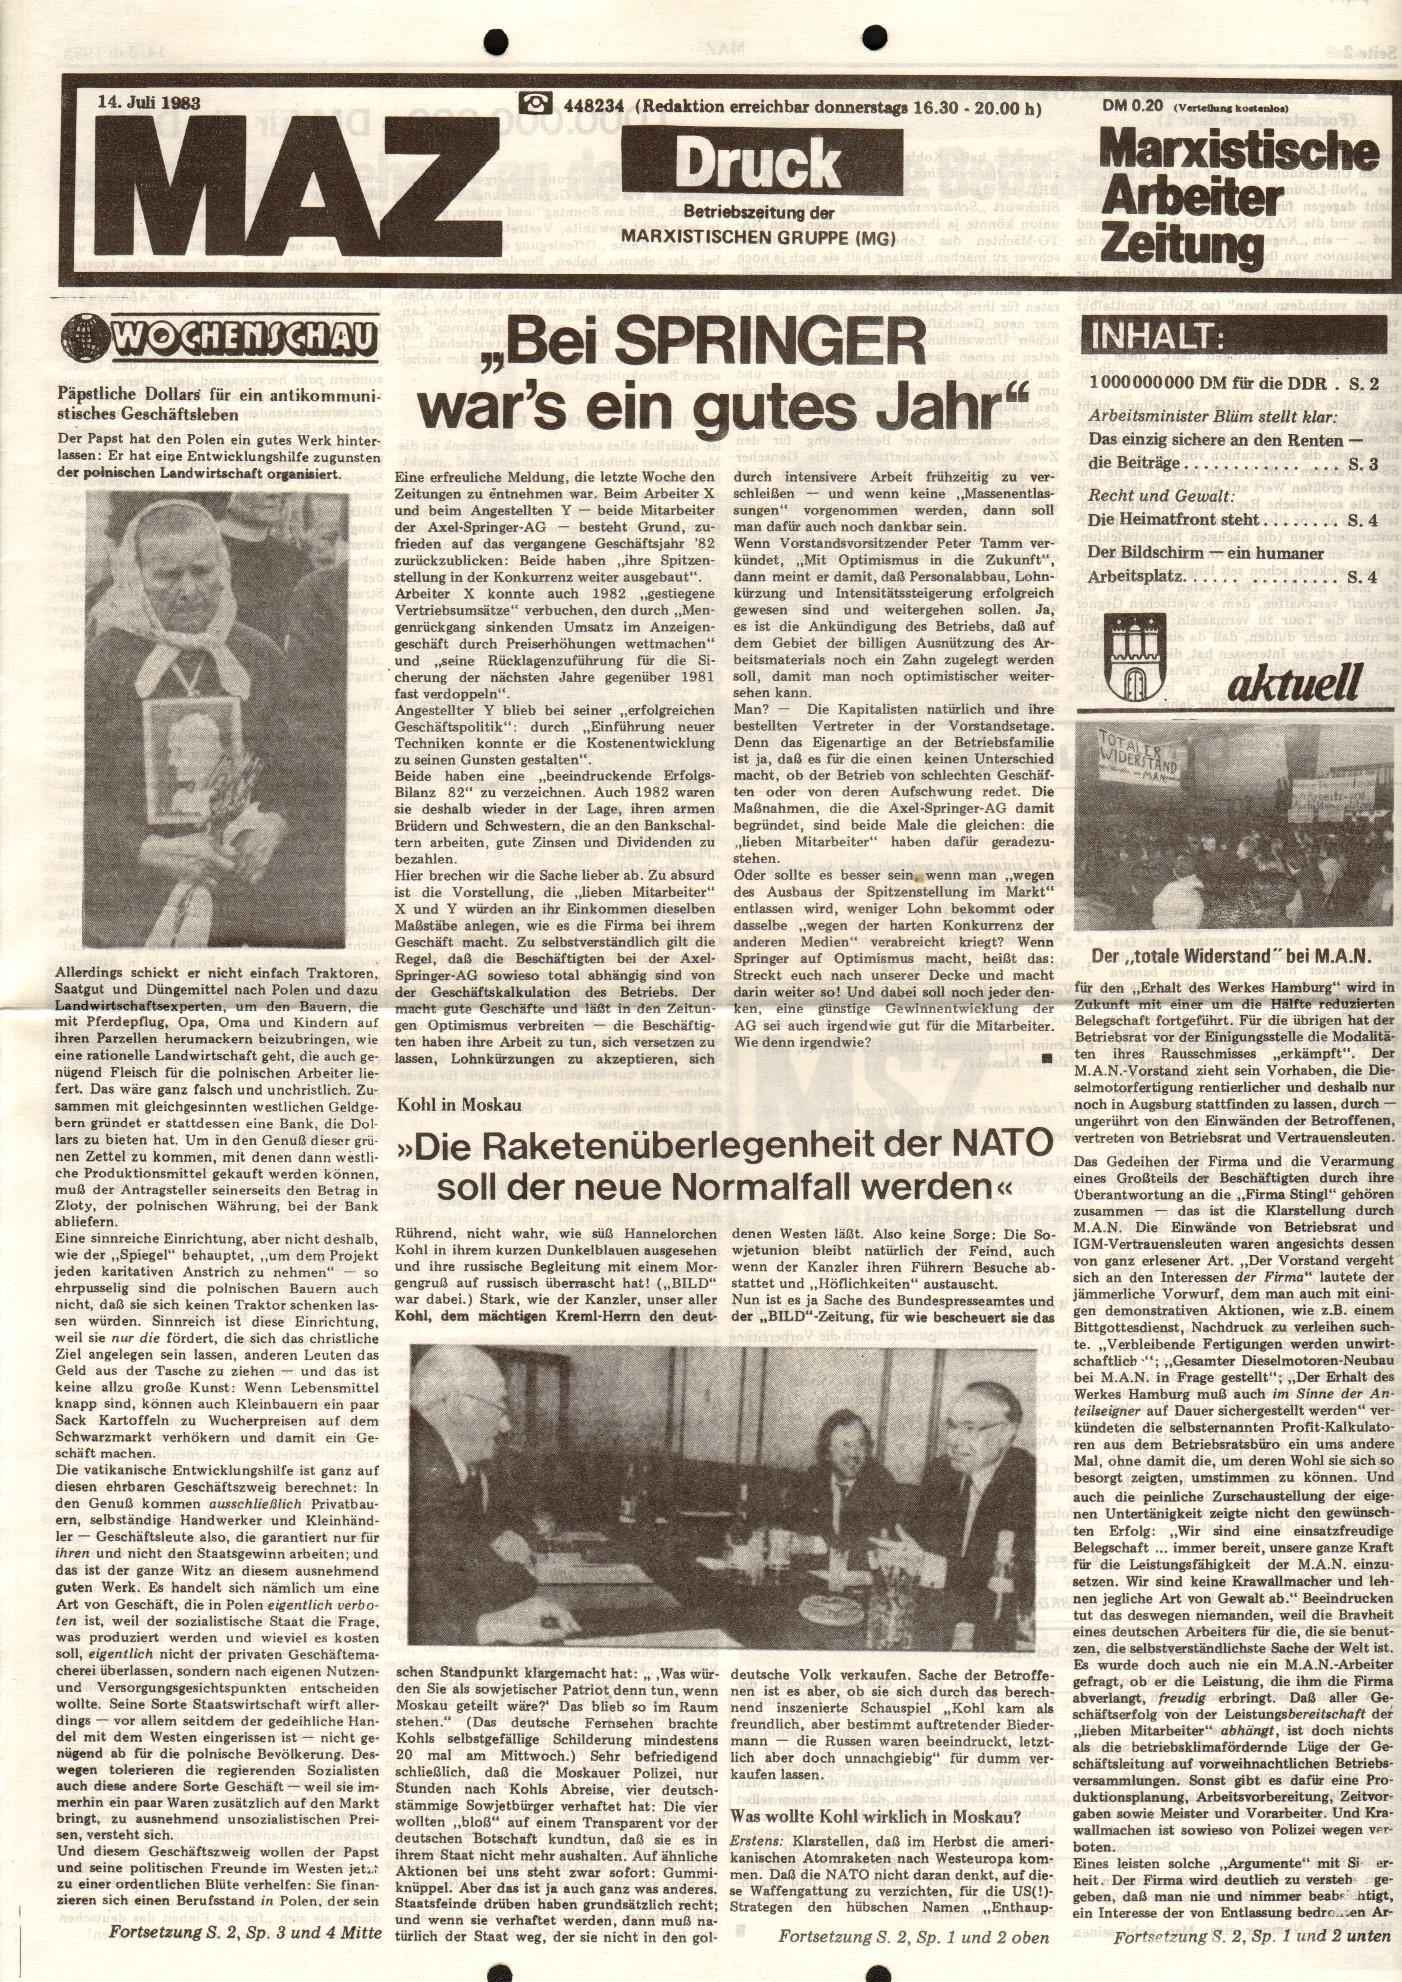 Hamburg_MG_MAZ_Druck_19830714_01